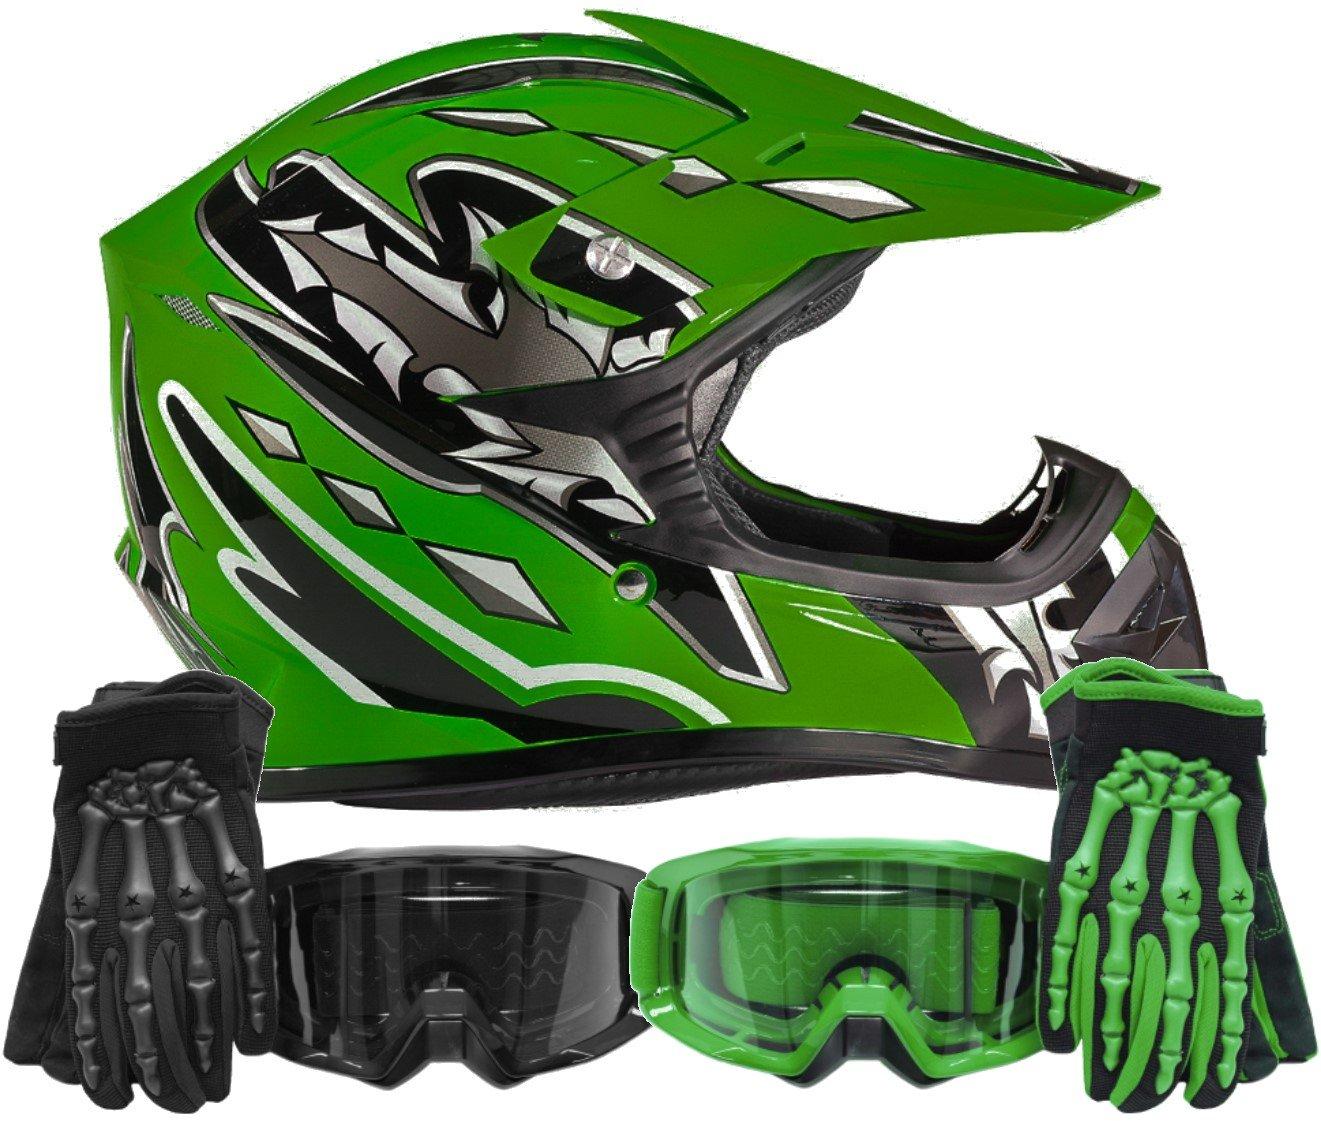 Typhoon Youth Kids Offroad Gear Combo Helmet Gloves Goggles DOT Motocross ATV Dirt Bike Motorcycle Green Black Small